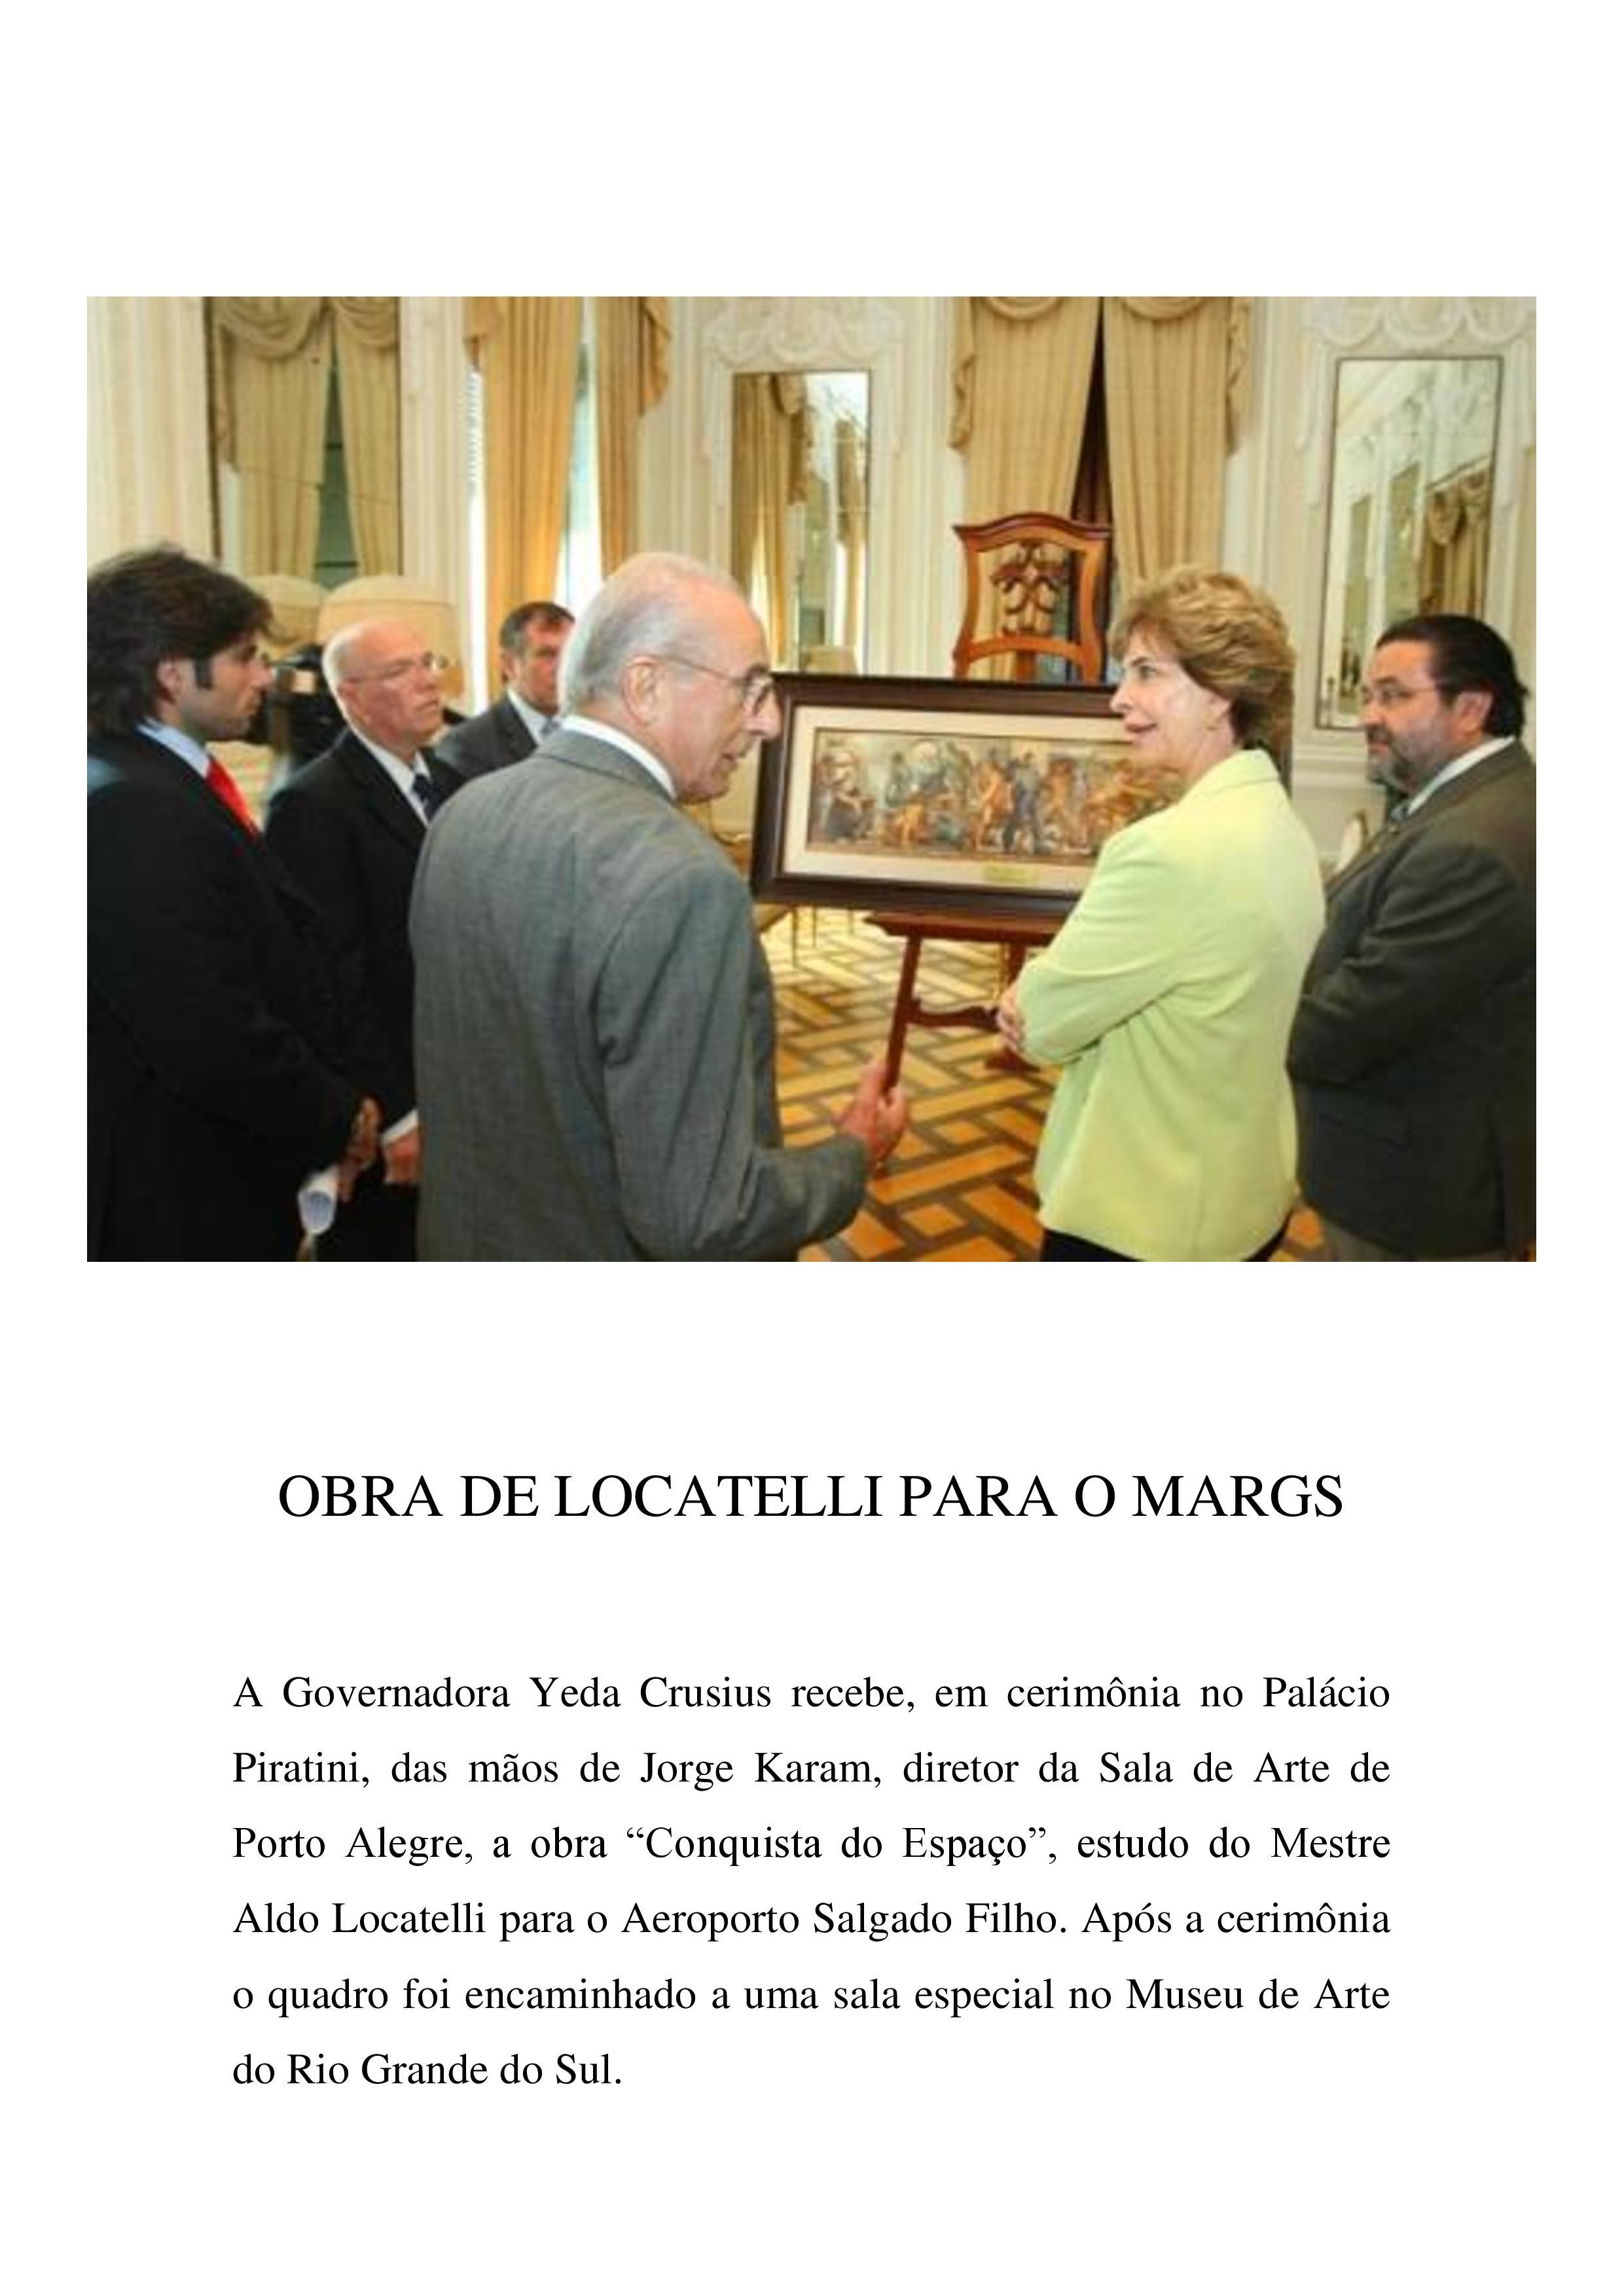 Obra de Locatelli para o MARGS